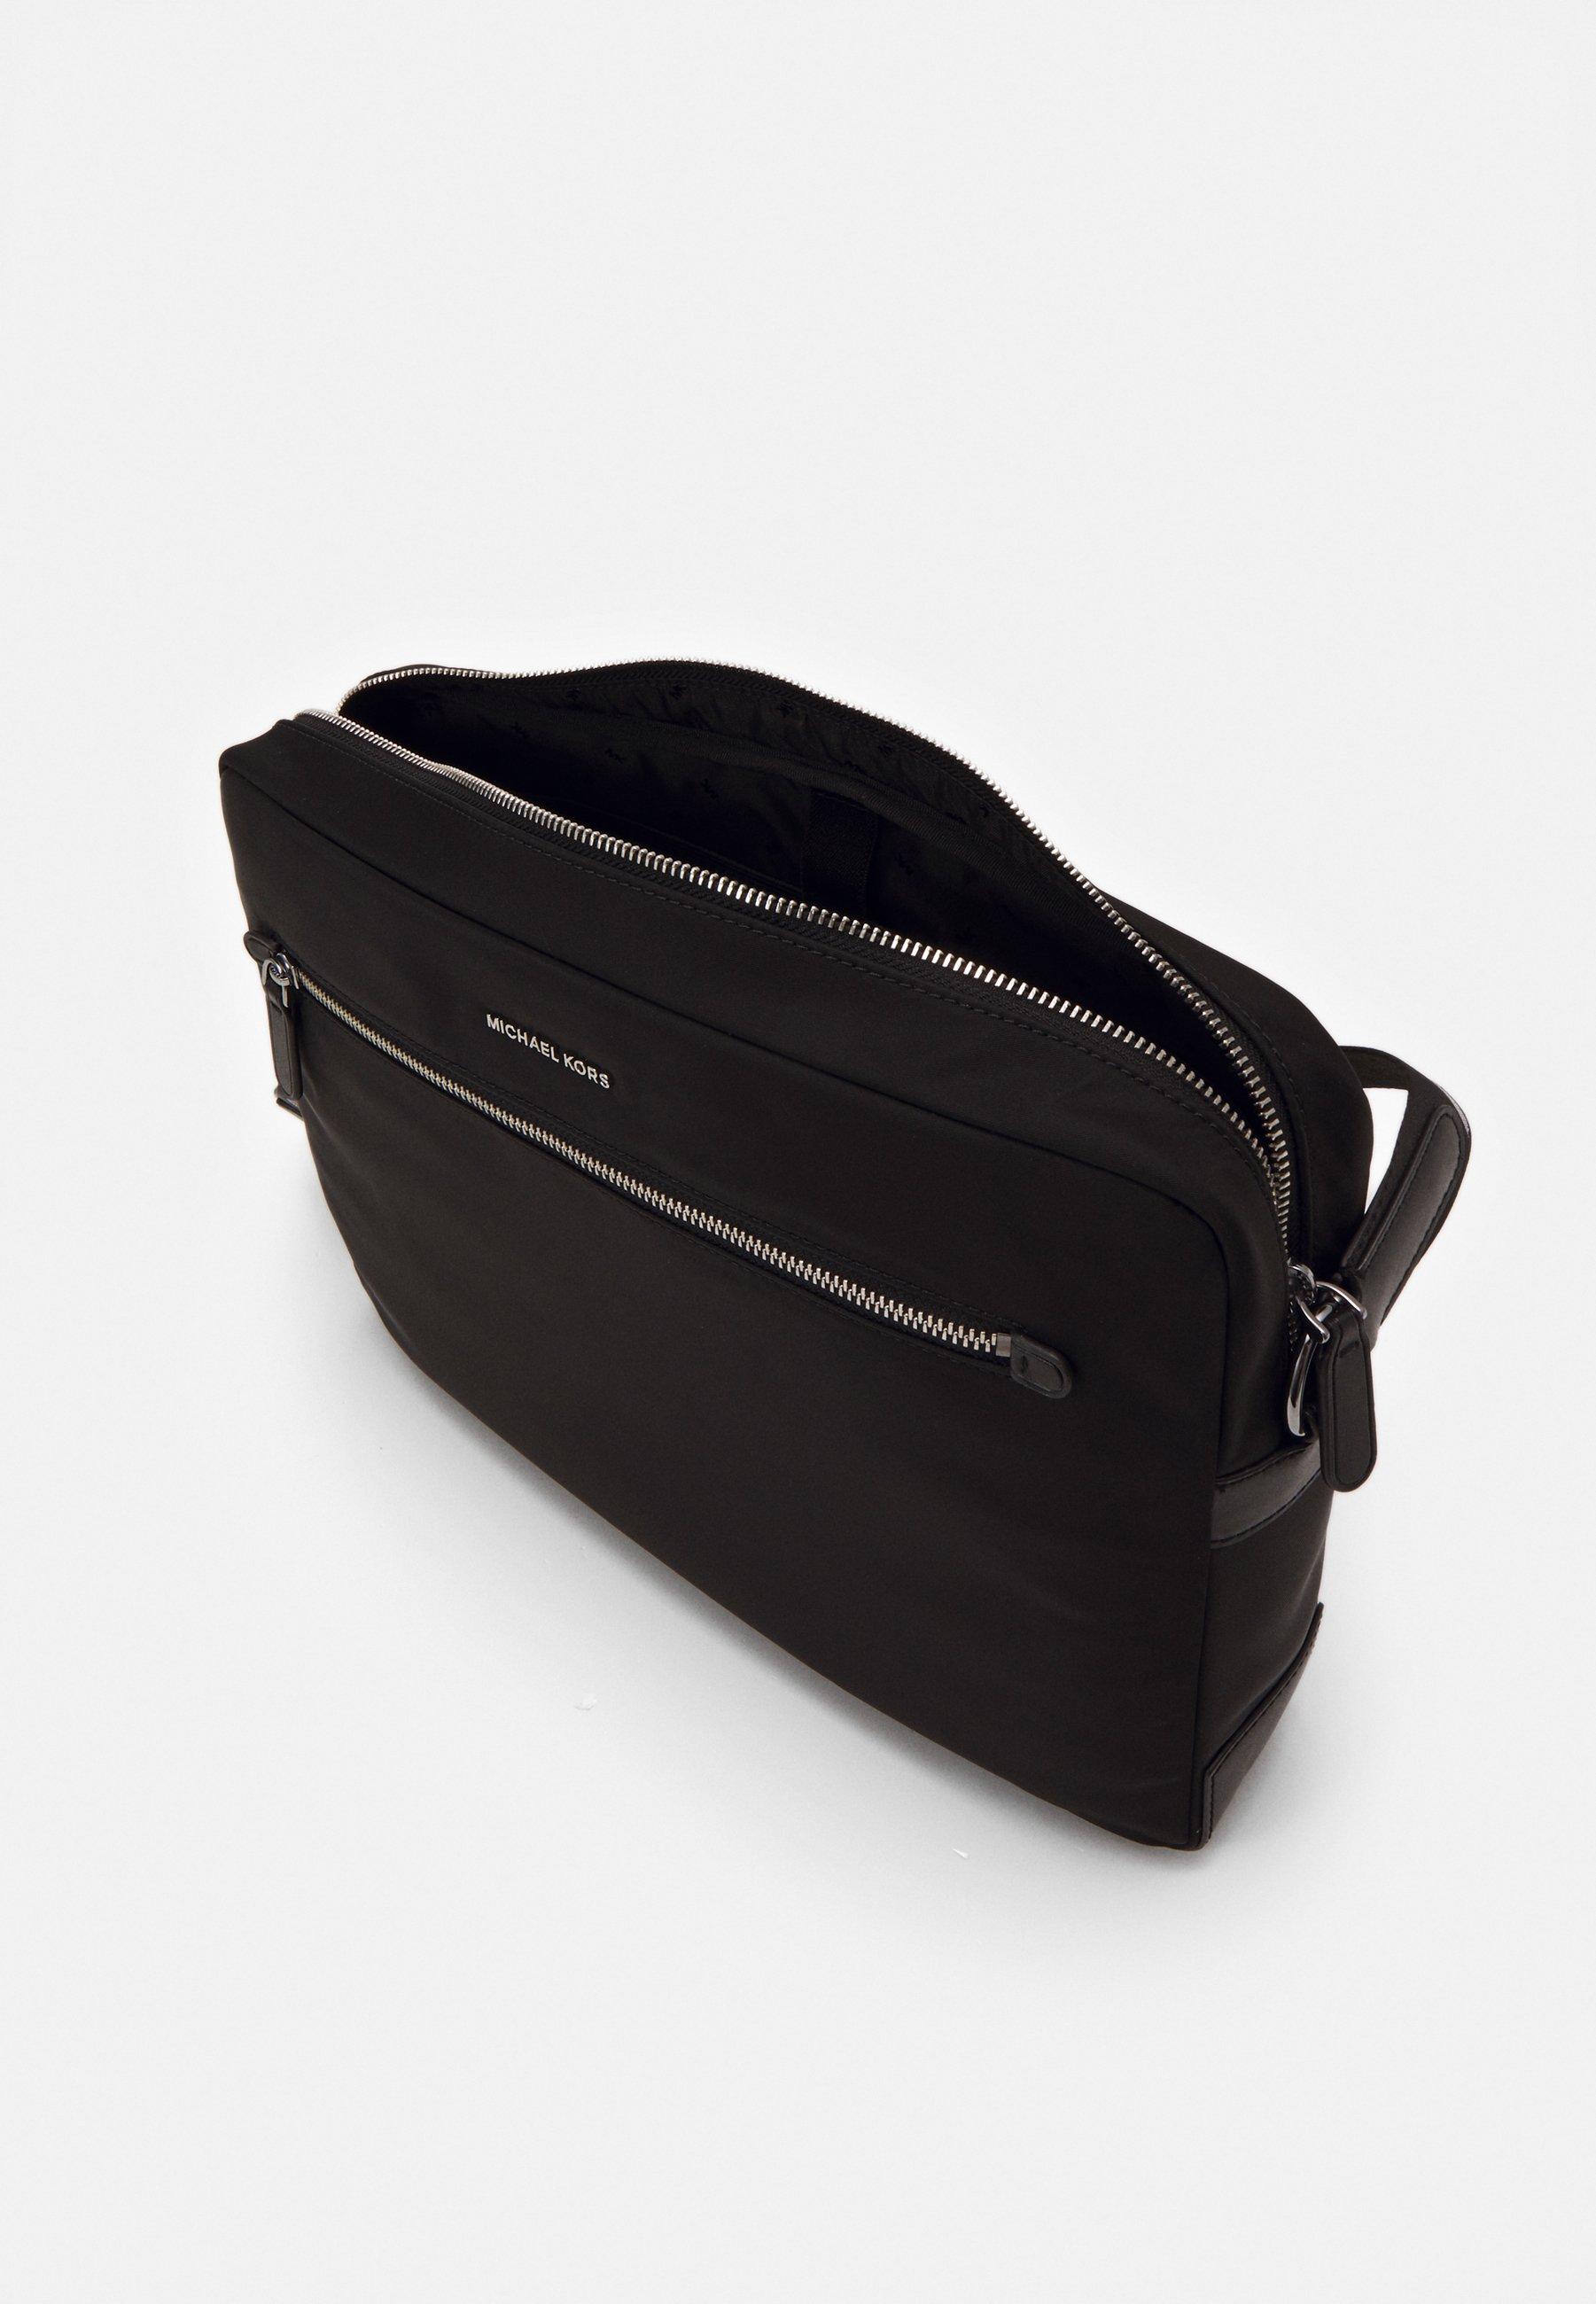 Michael Kors CAMERA BAG UNISEX - Sac ordinateur - black/noir ...